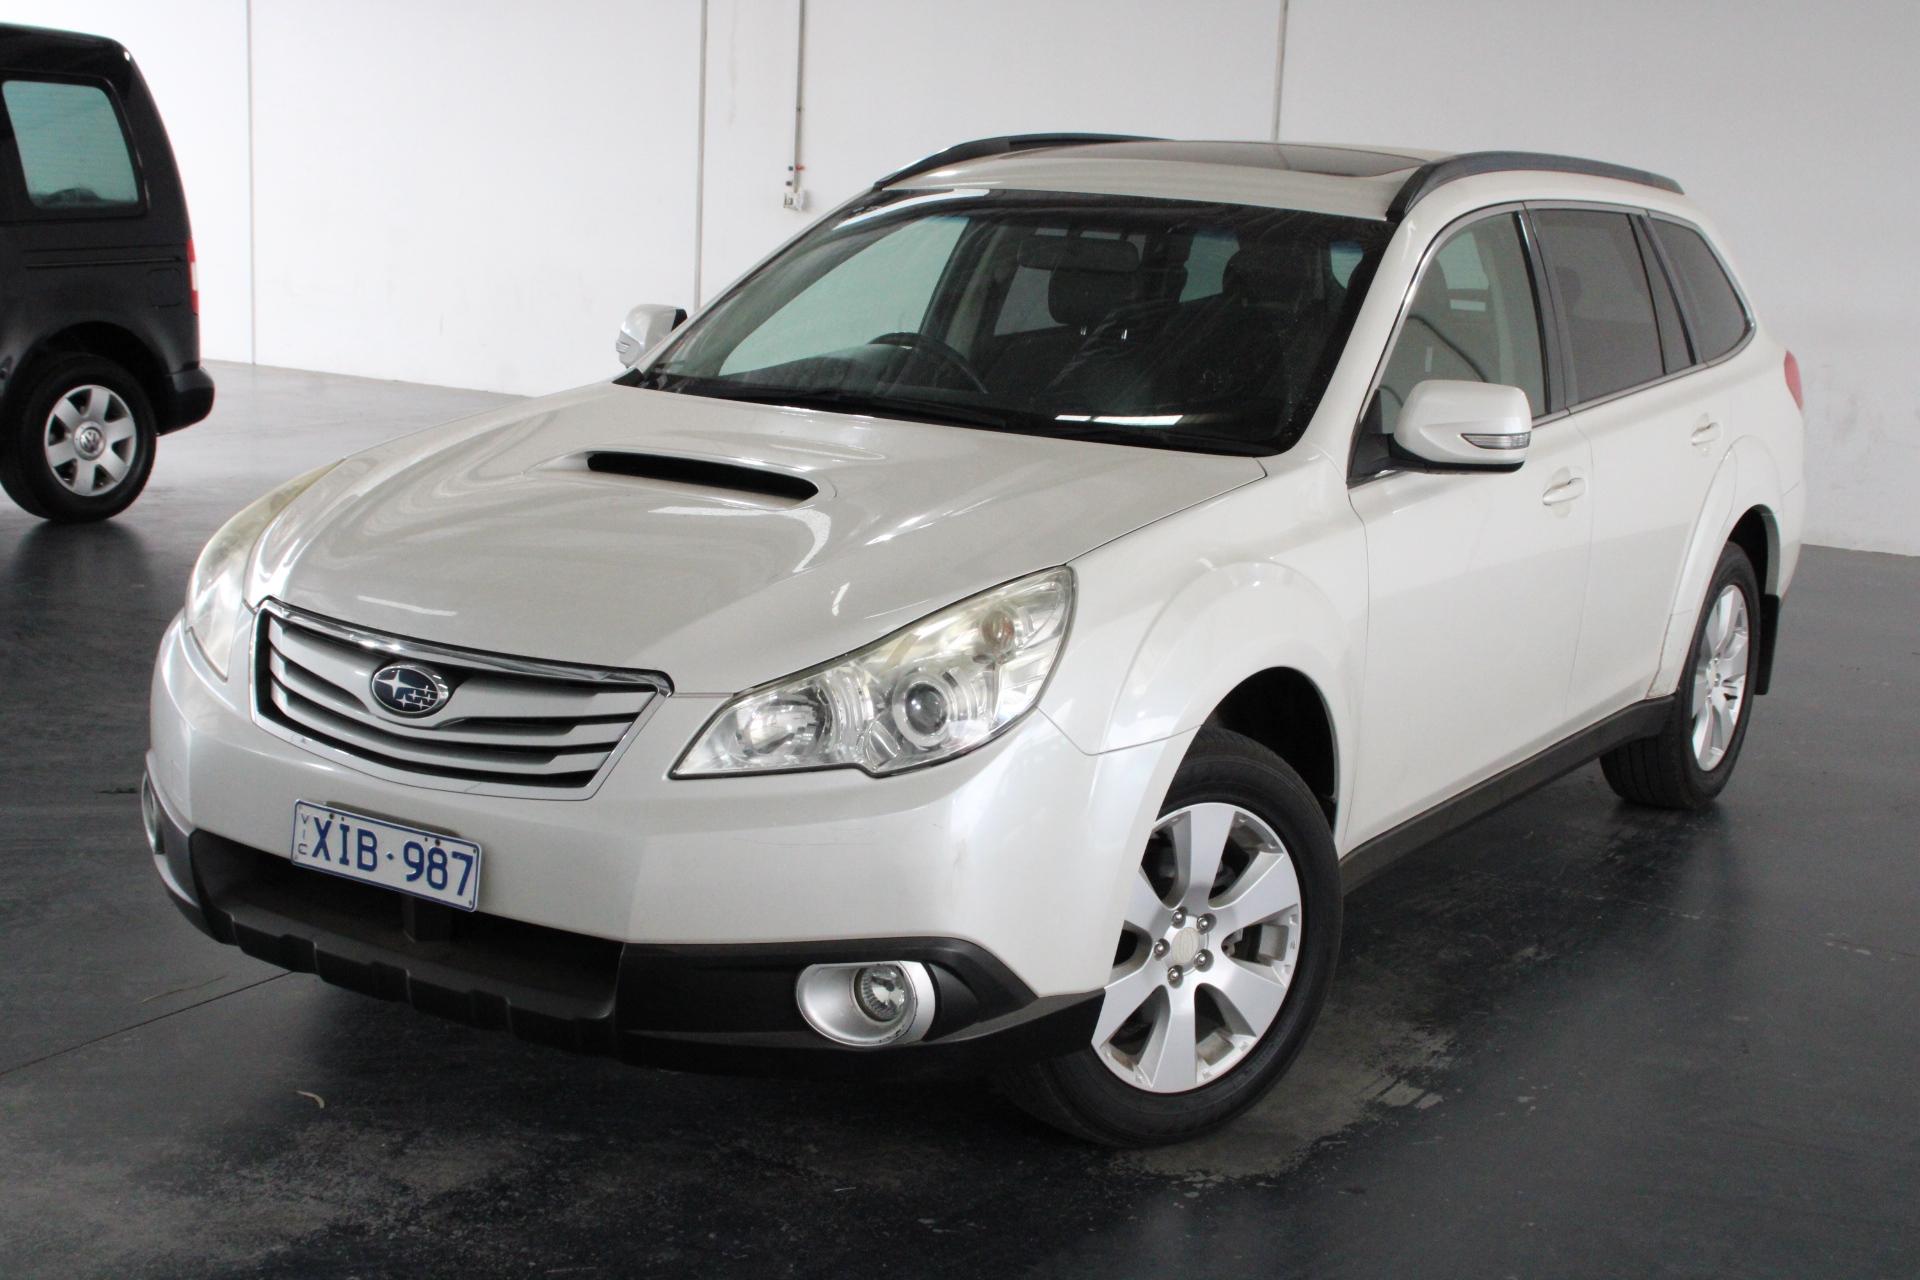 2009 Subaru Outback 2.0D Premium B5A Turbo Diesel Manual Wagon